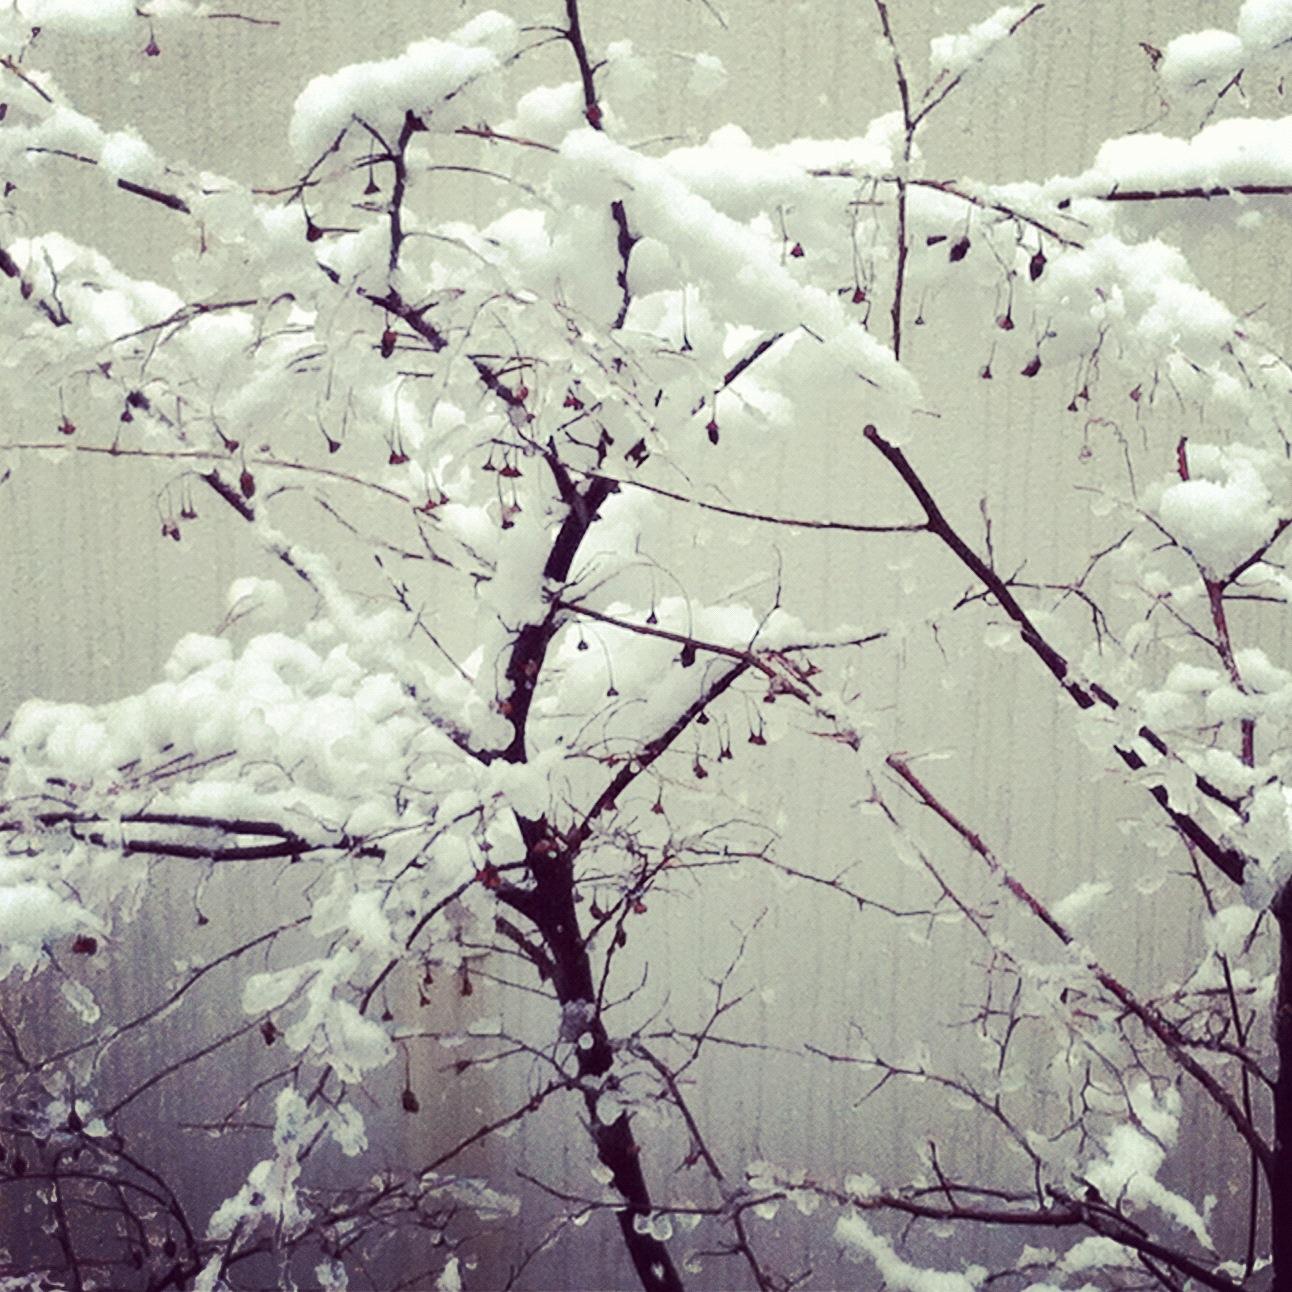 SNOW 01 2012